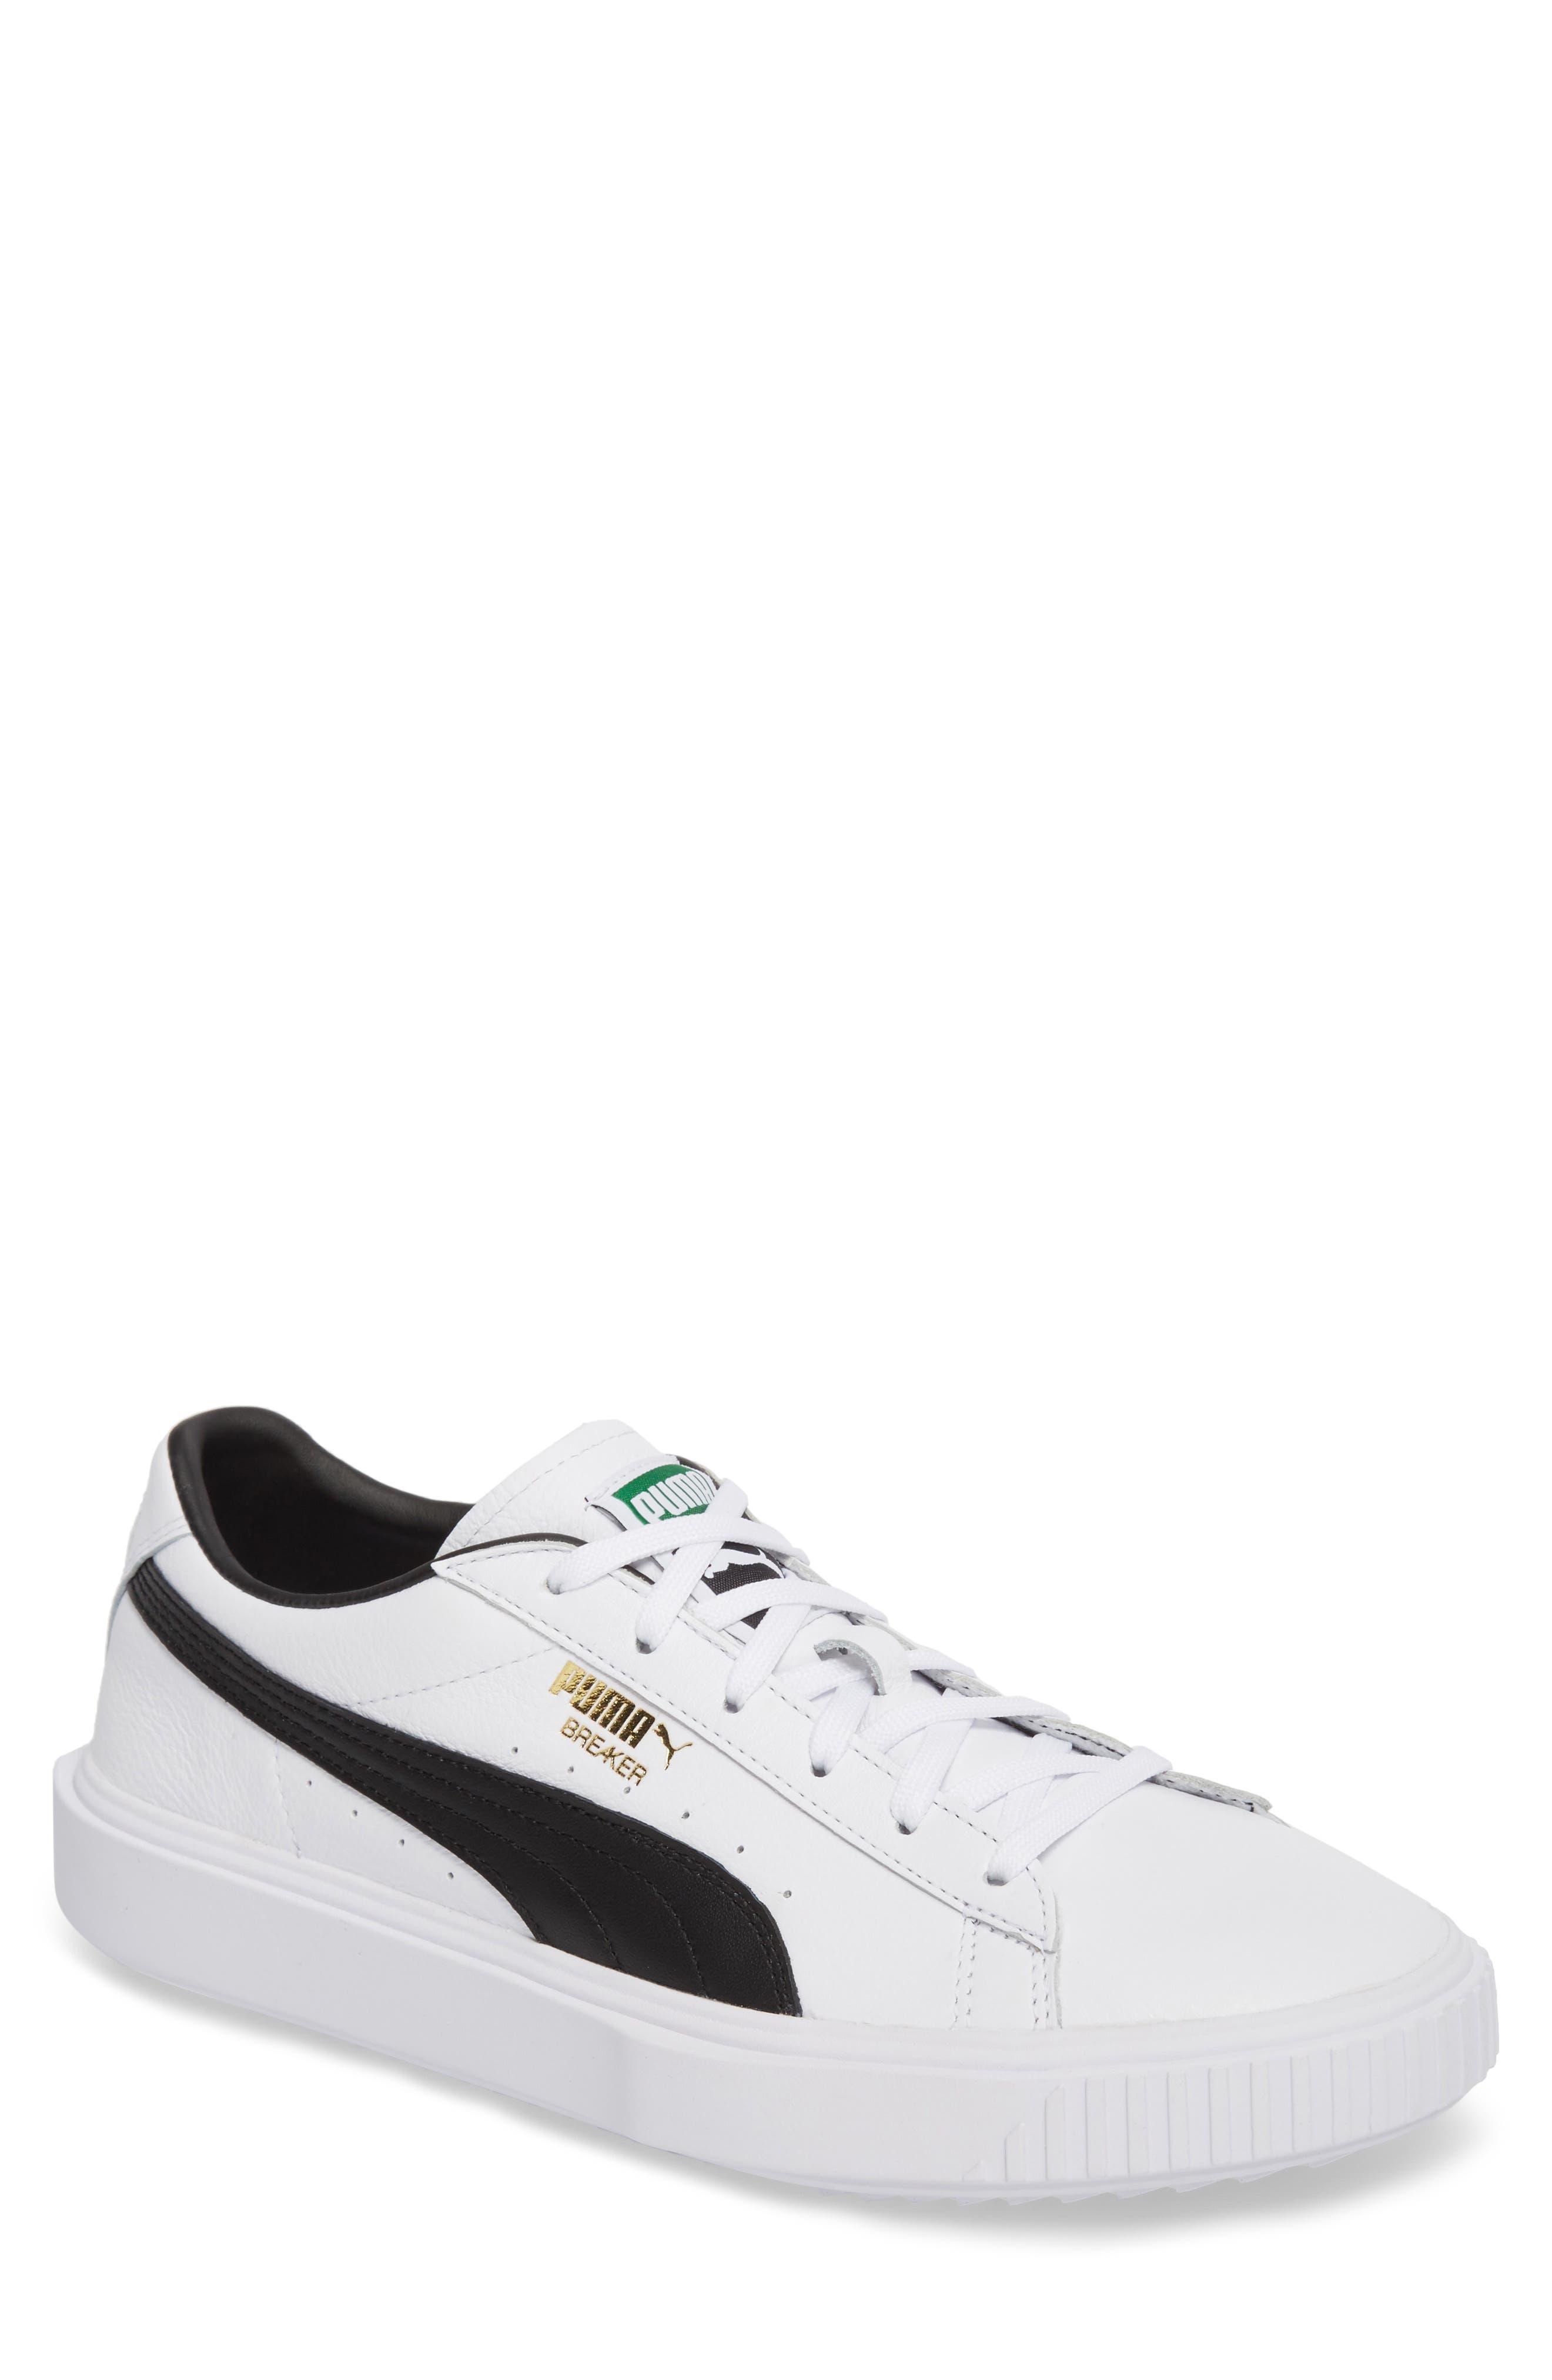 PUMA Breaker Low Top Sneaker (Men)